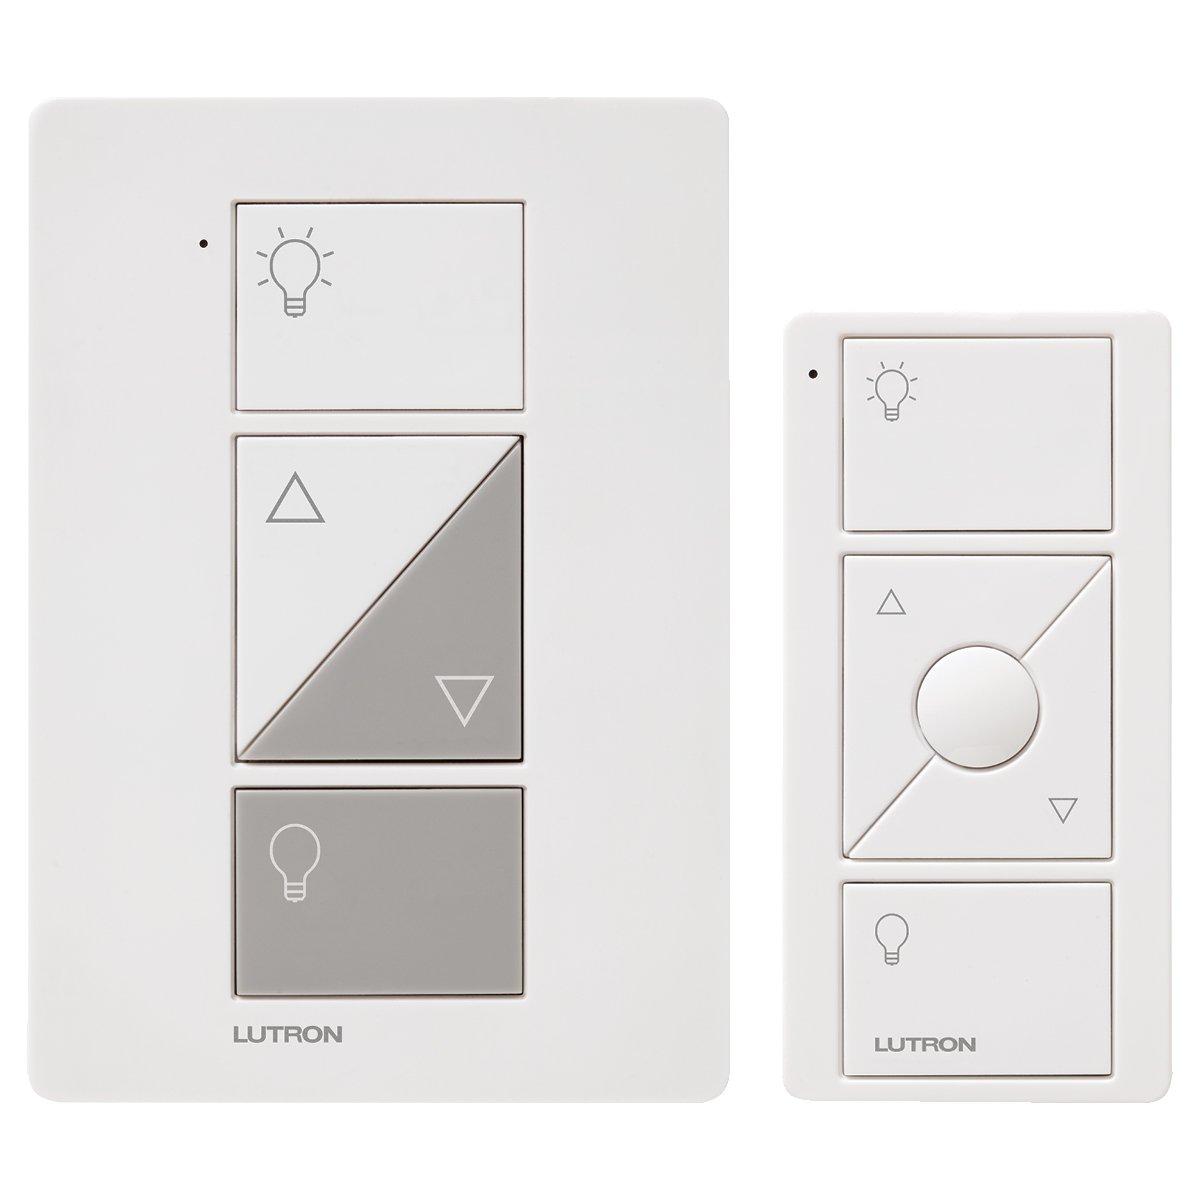 Lutron P-Pkg1P-Wh Caseta Wireless 300-Watt/100-Watt Plug-In Lamp Dimmer With.. 4